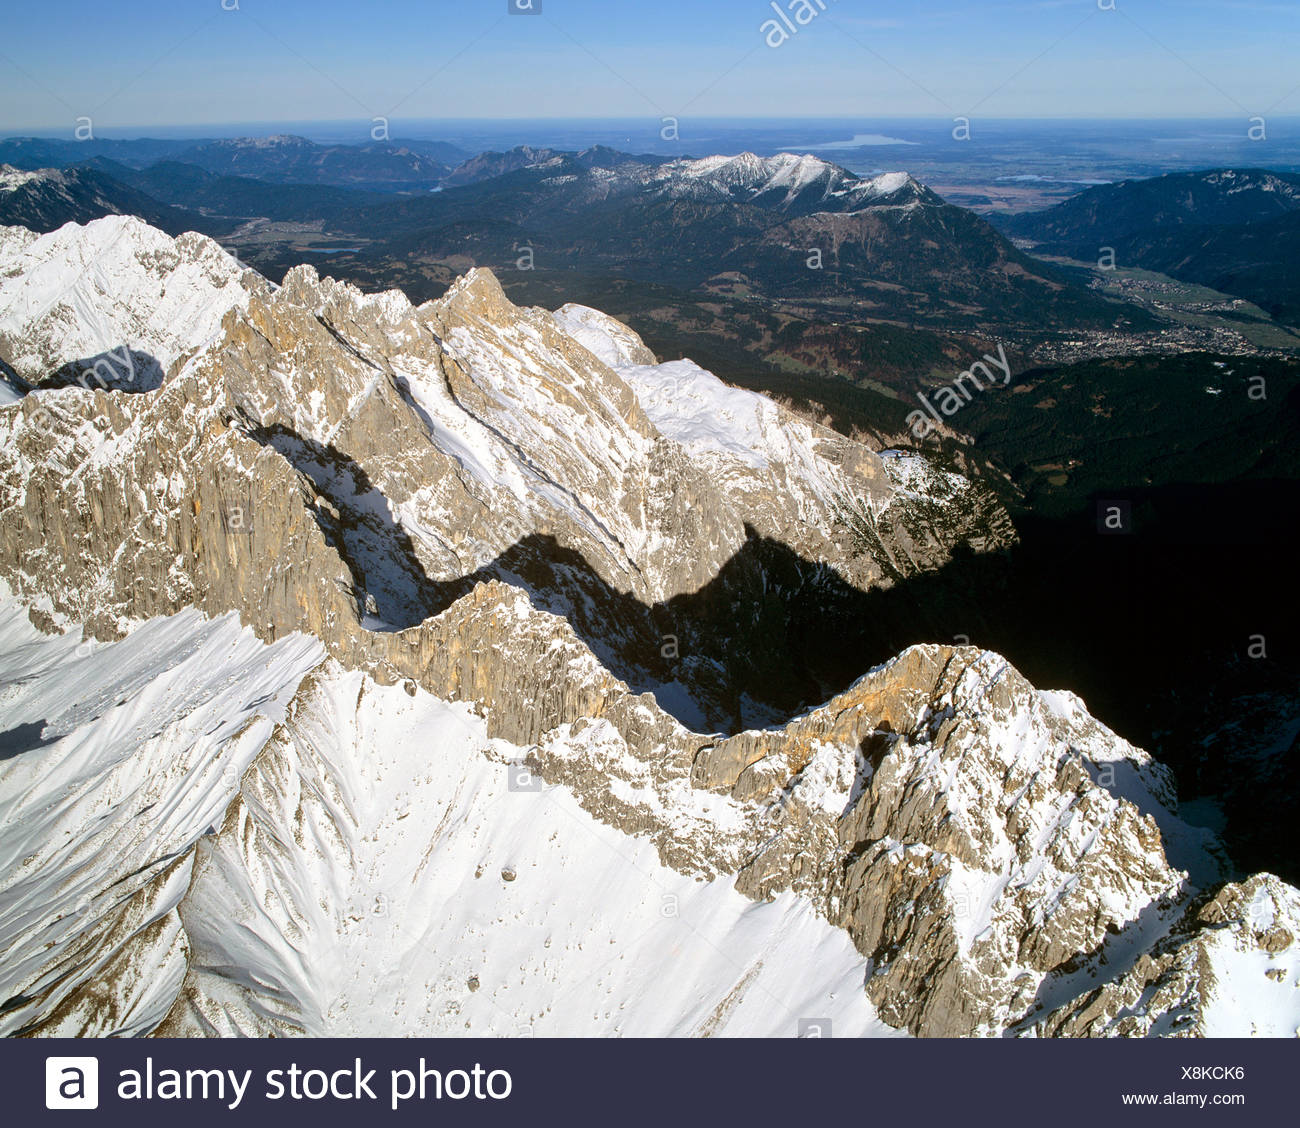 Wetterstein main ridge, left hand Oberreintalschrofen, Scharnitzspitze and Schuesselkar, left hand Loisachtal, Wettersteingebir - Stock Image